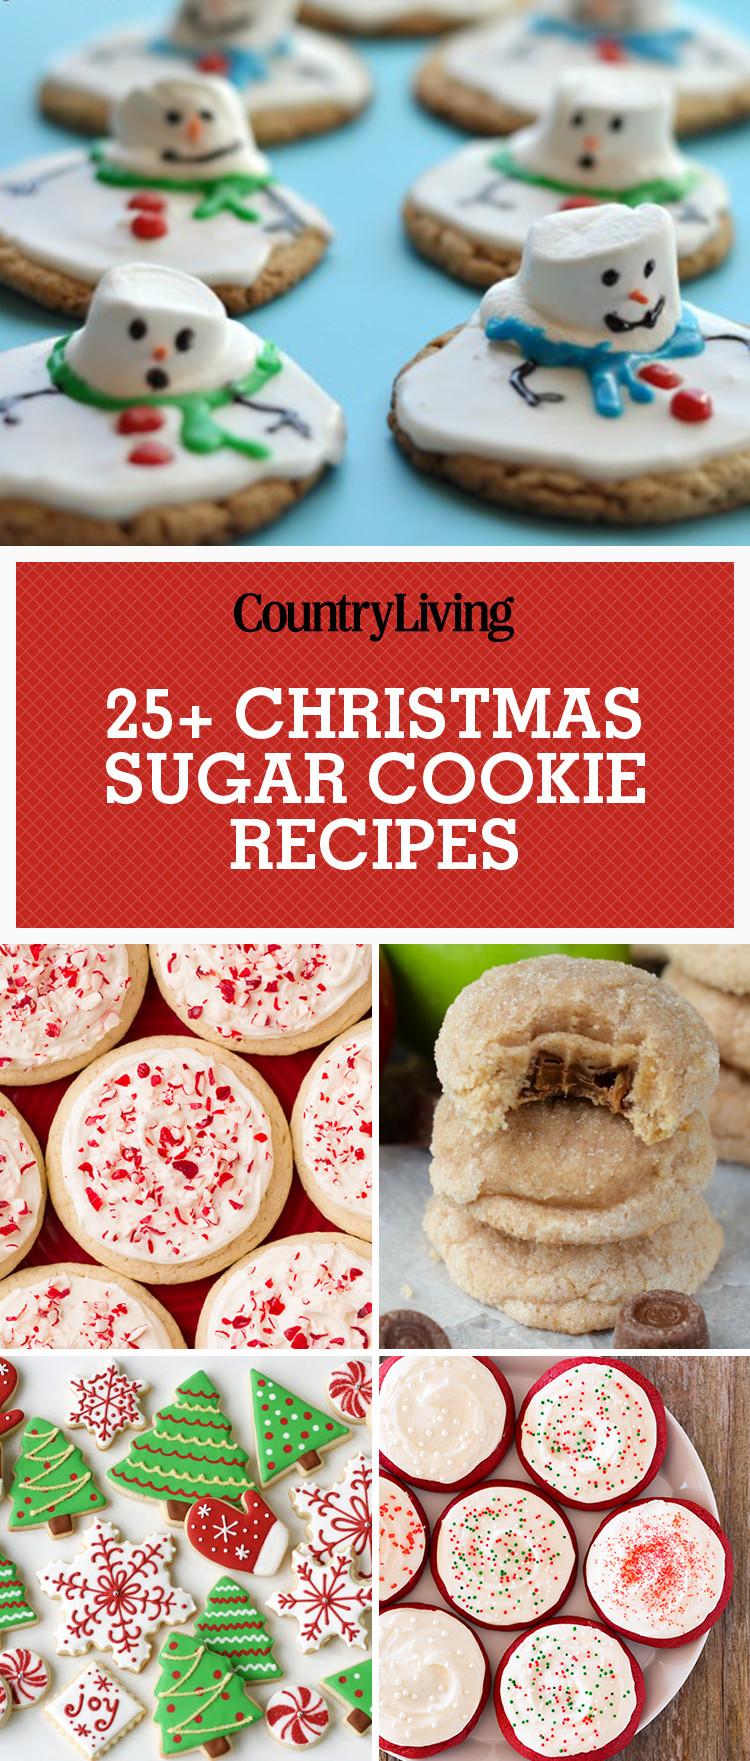 Christmas Sugar Cookies Recipes  25 Easy Christmas Sugar Cookies Recipes & Decorating